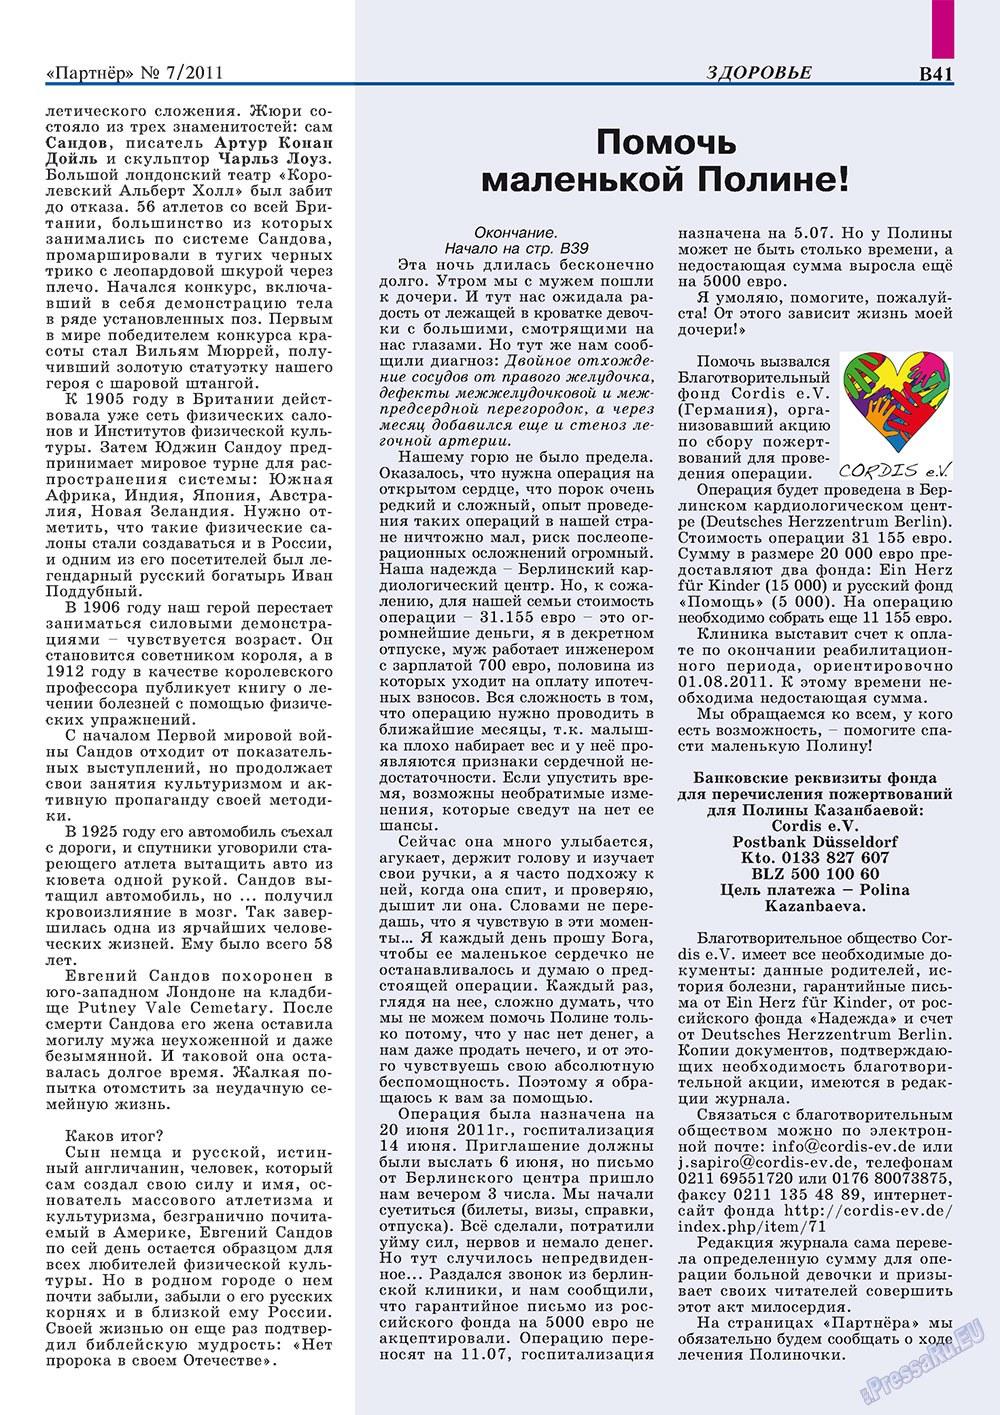 Партнер-север (журнал). 2011 год, номер 7, стр. 51